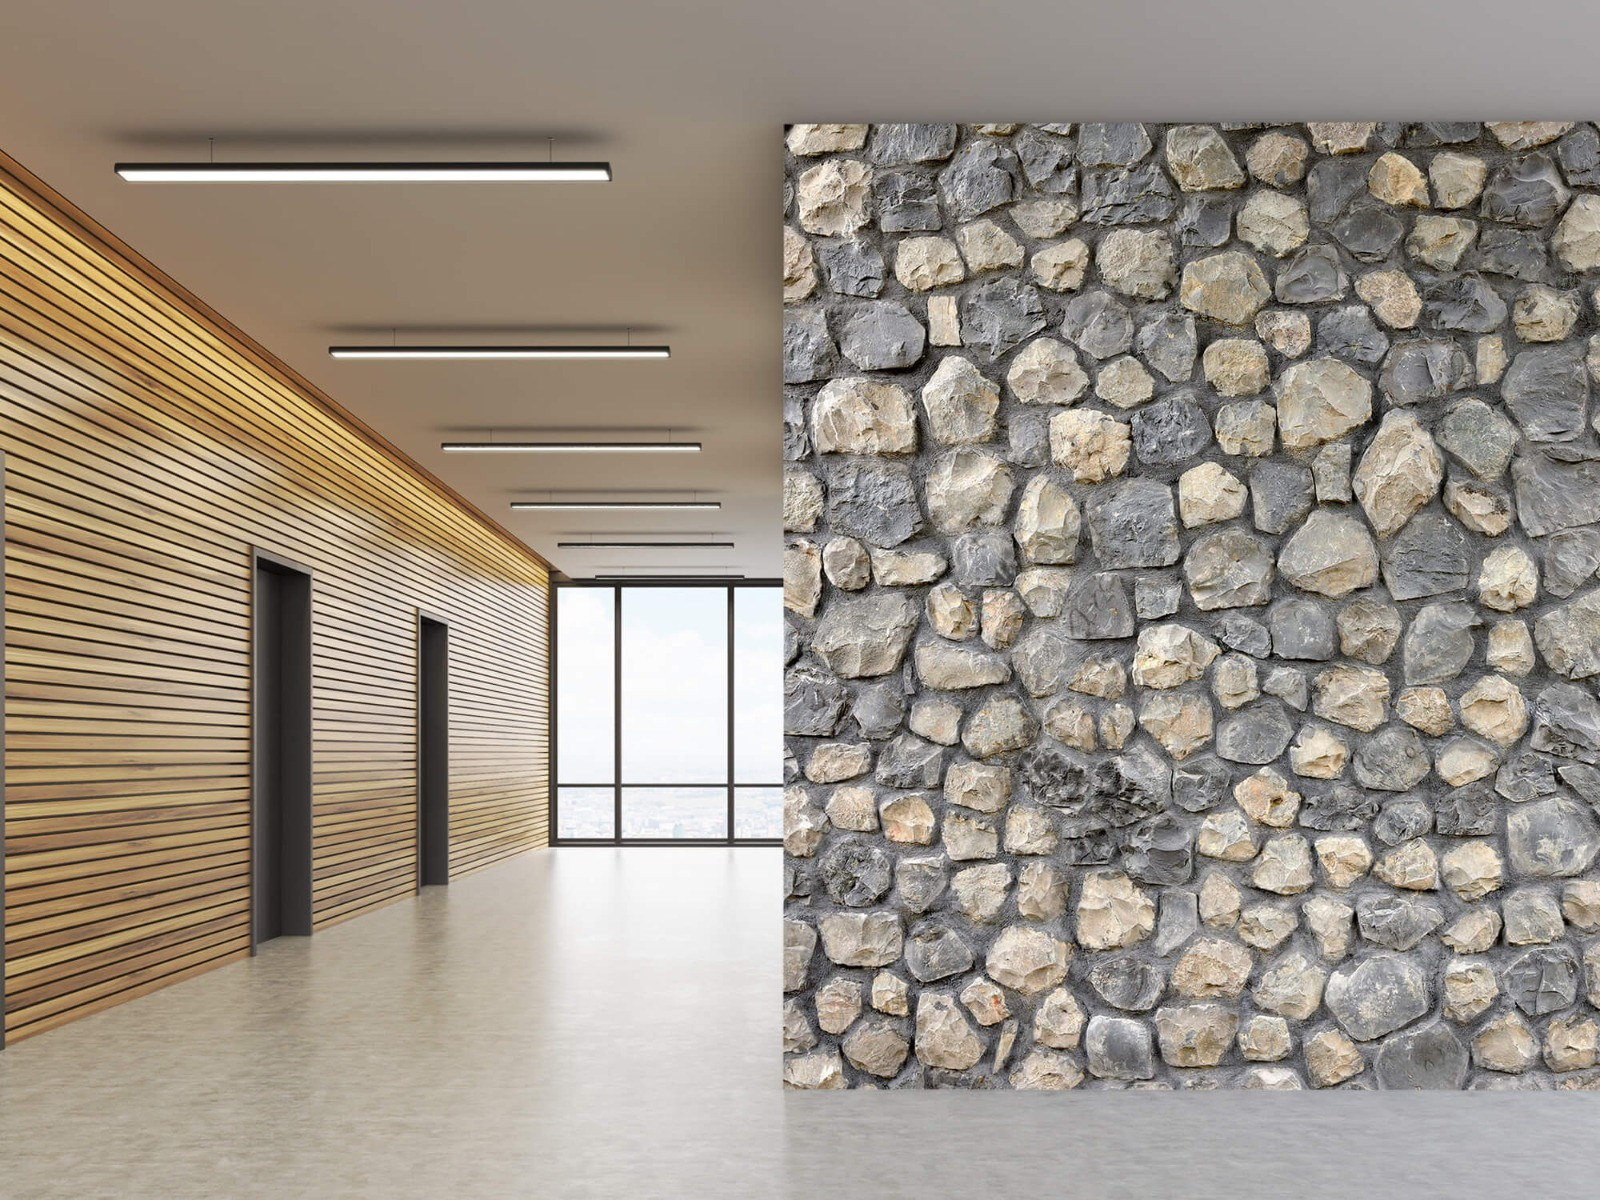 Steen behang - Breukstenen - Wallexclusive - Ontvangstruimte 1